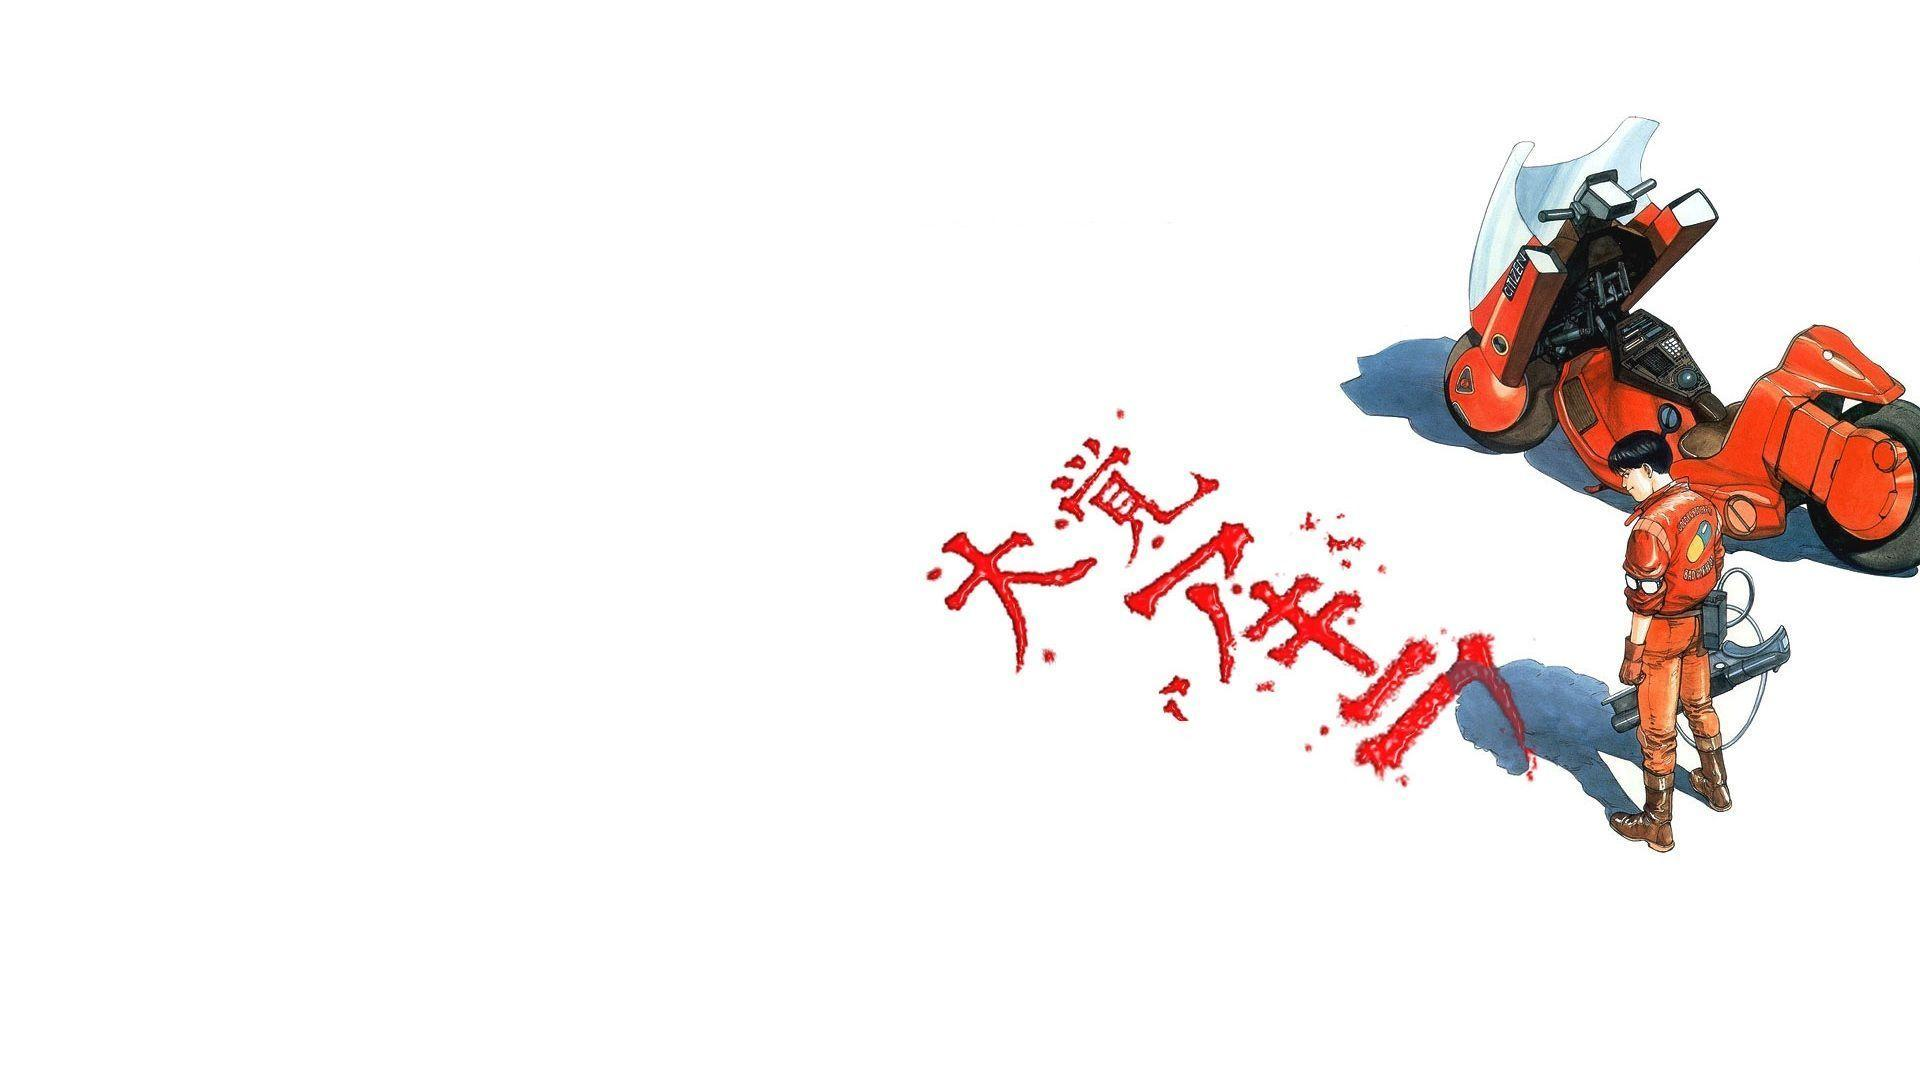 hd akira wallpaper-#3